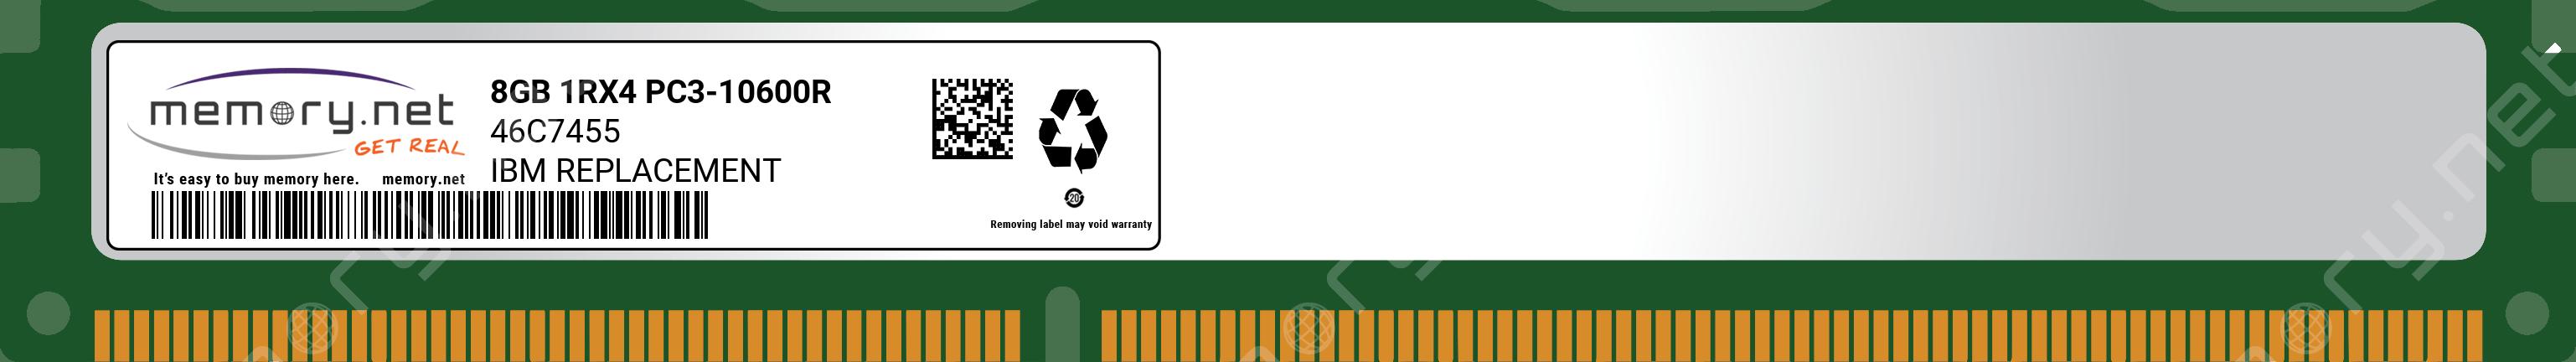 46C7455